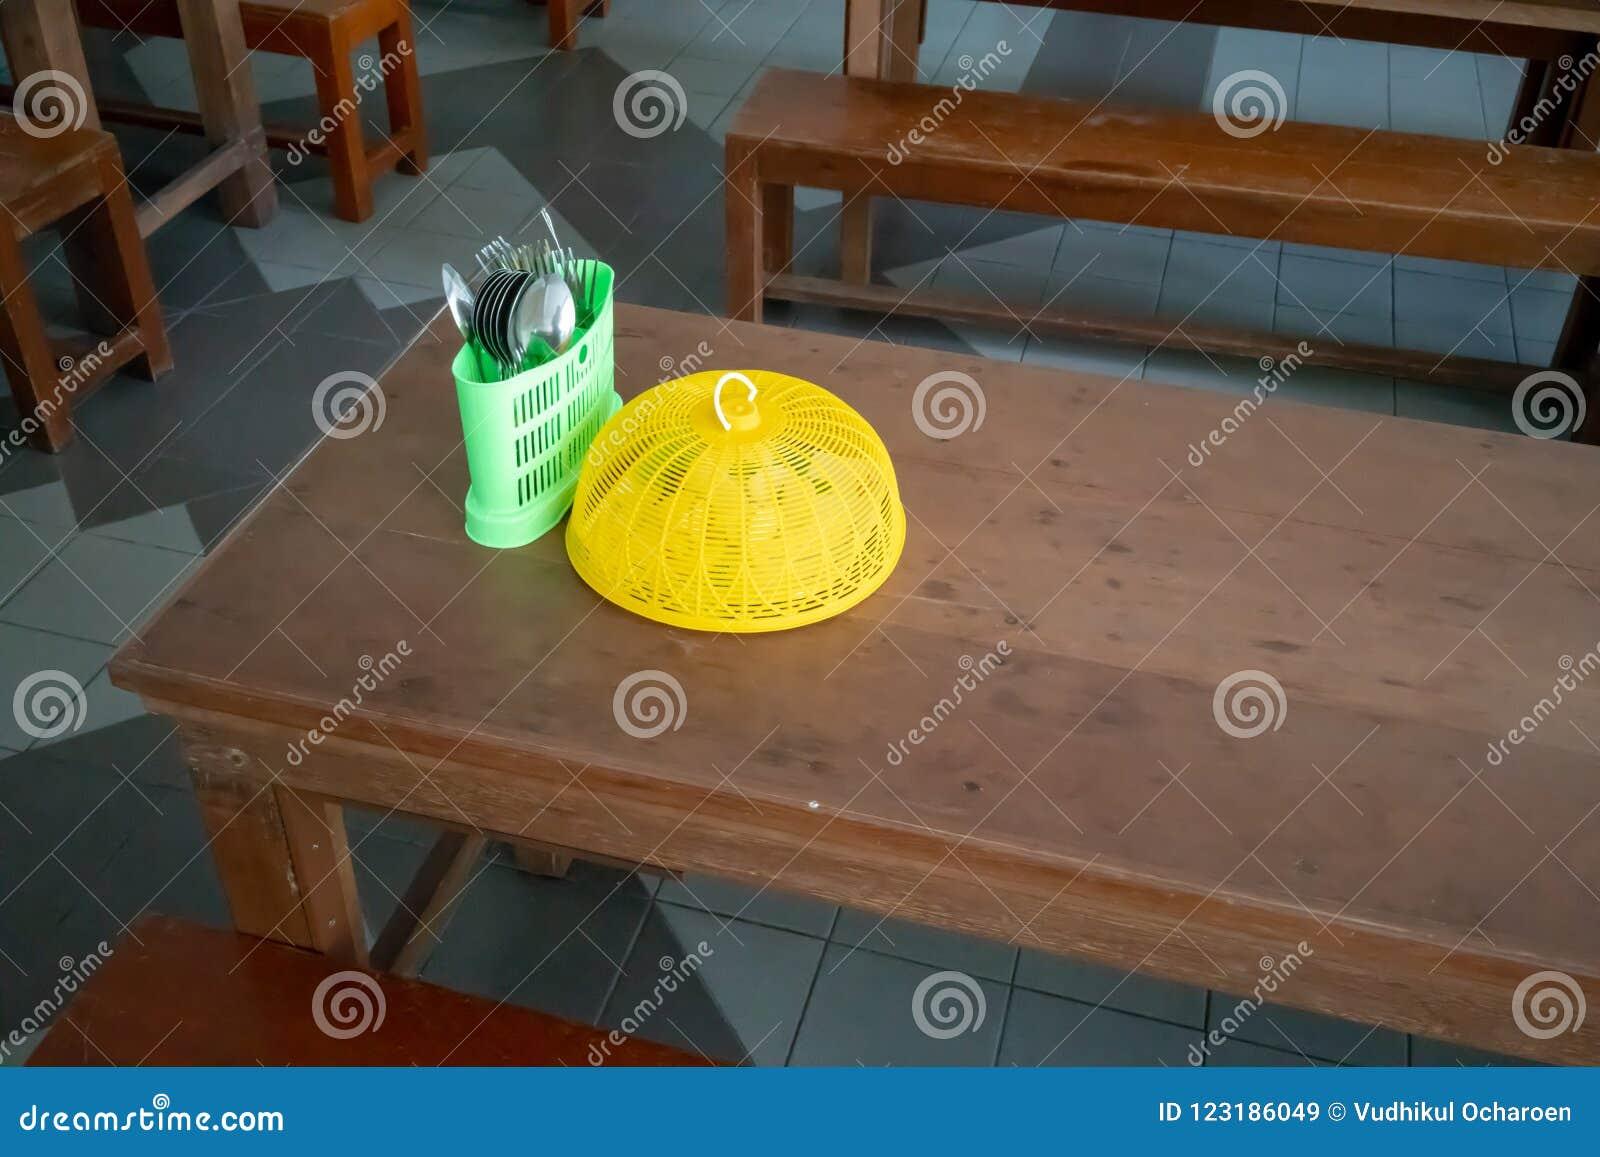 Astounding Wooden Table Set Up With Long Bench For Kindergarten Creativecarmelina Interior Chair Design Creativecarmelinacom